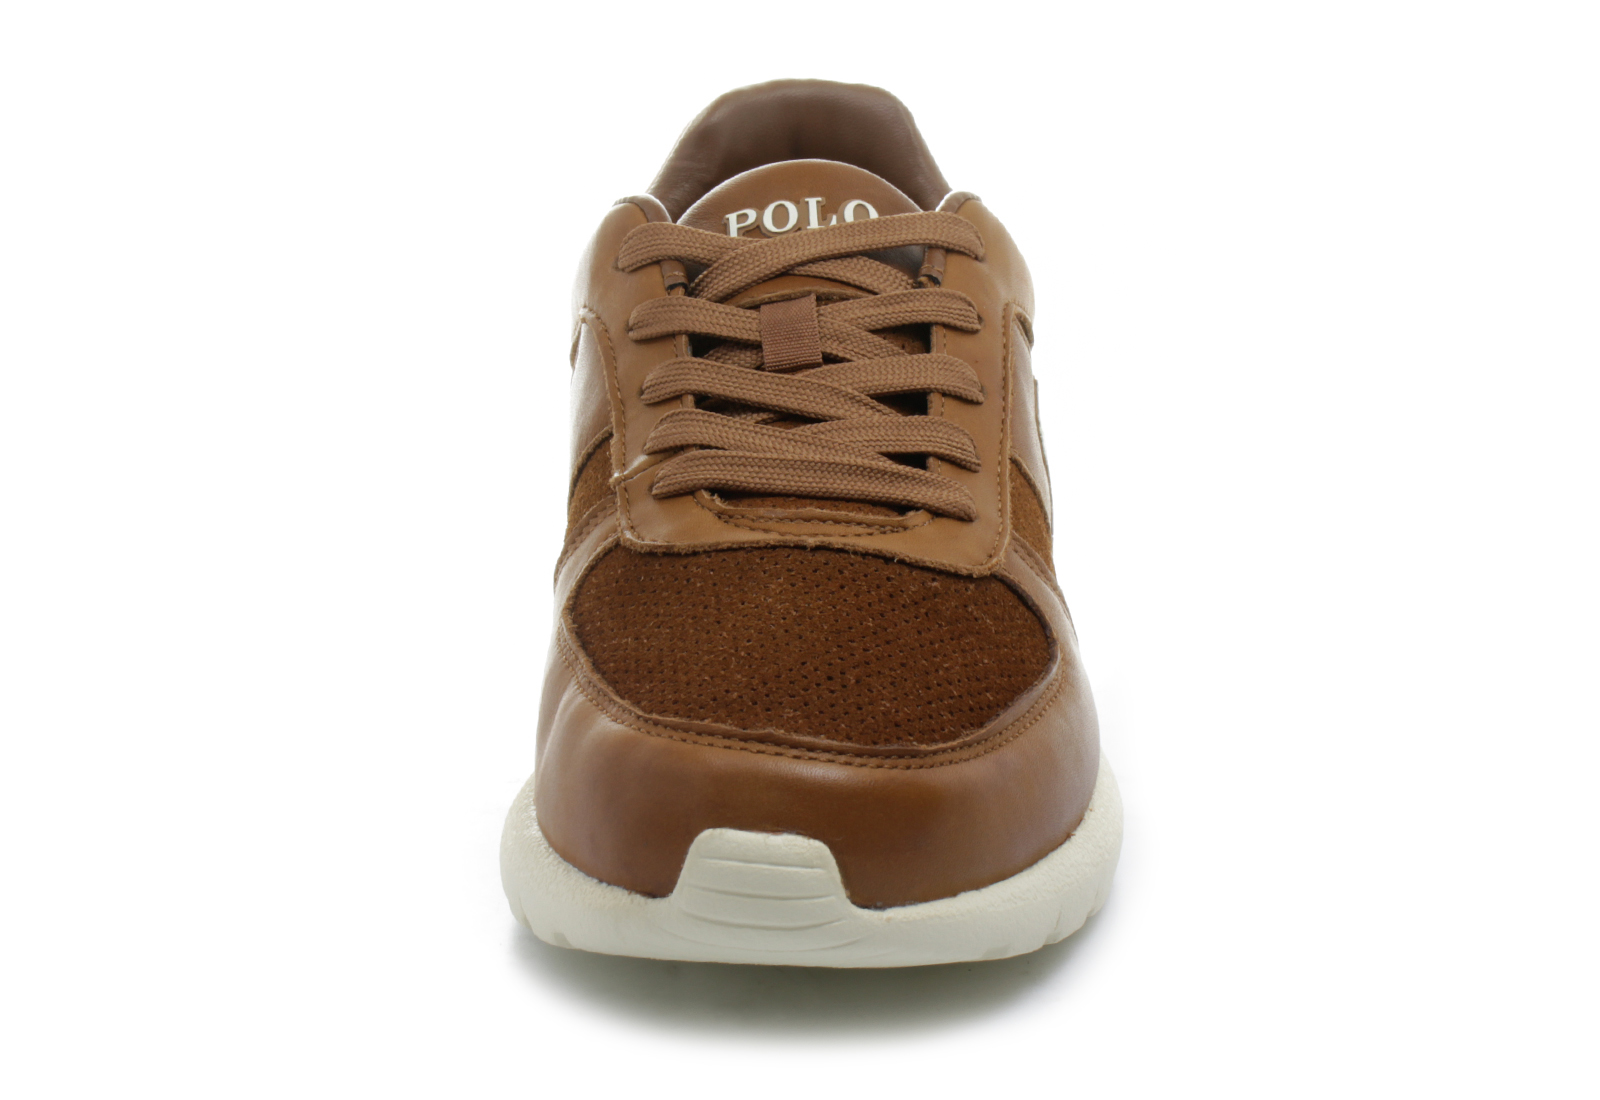 Polo Ralph Lauren Cipő - Cordell - 816664689001 - Office Shoes ... 943899aa76